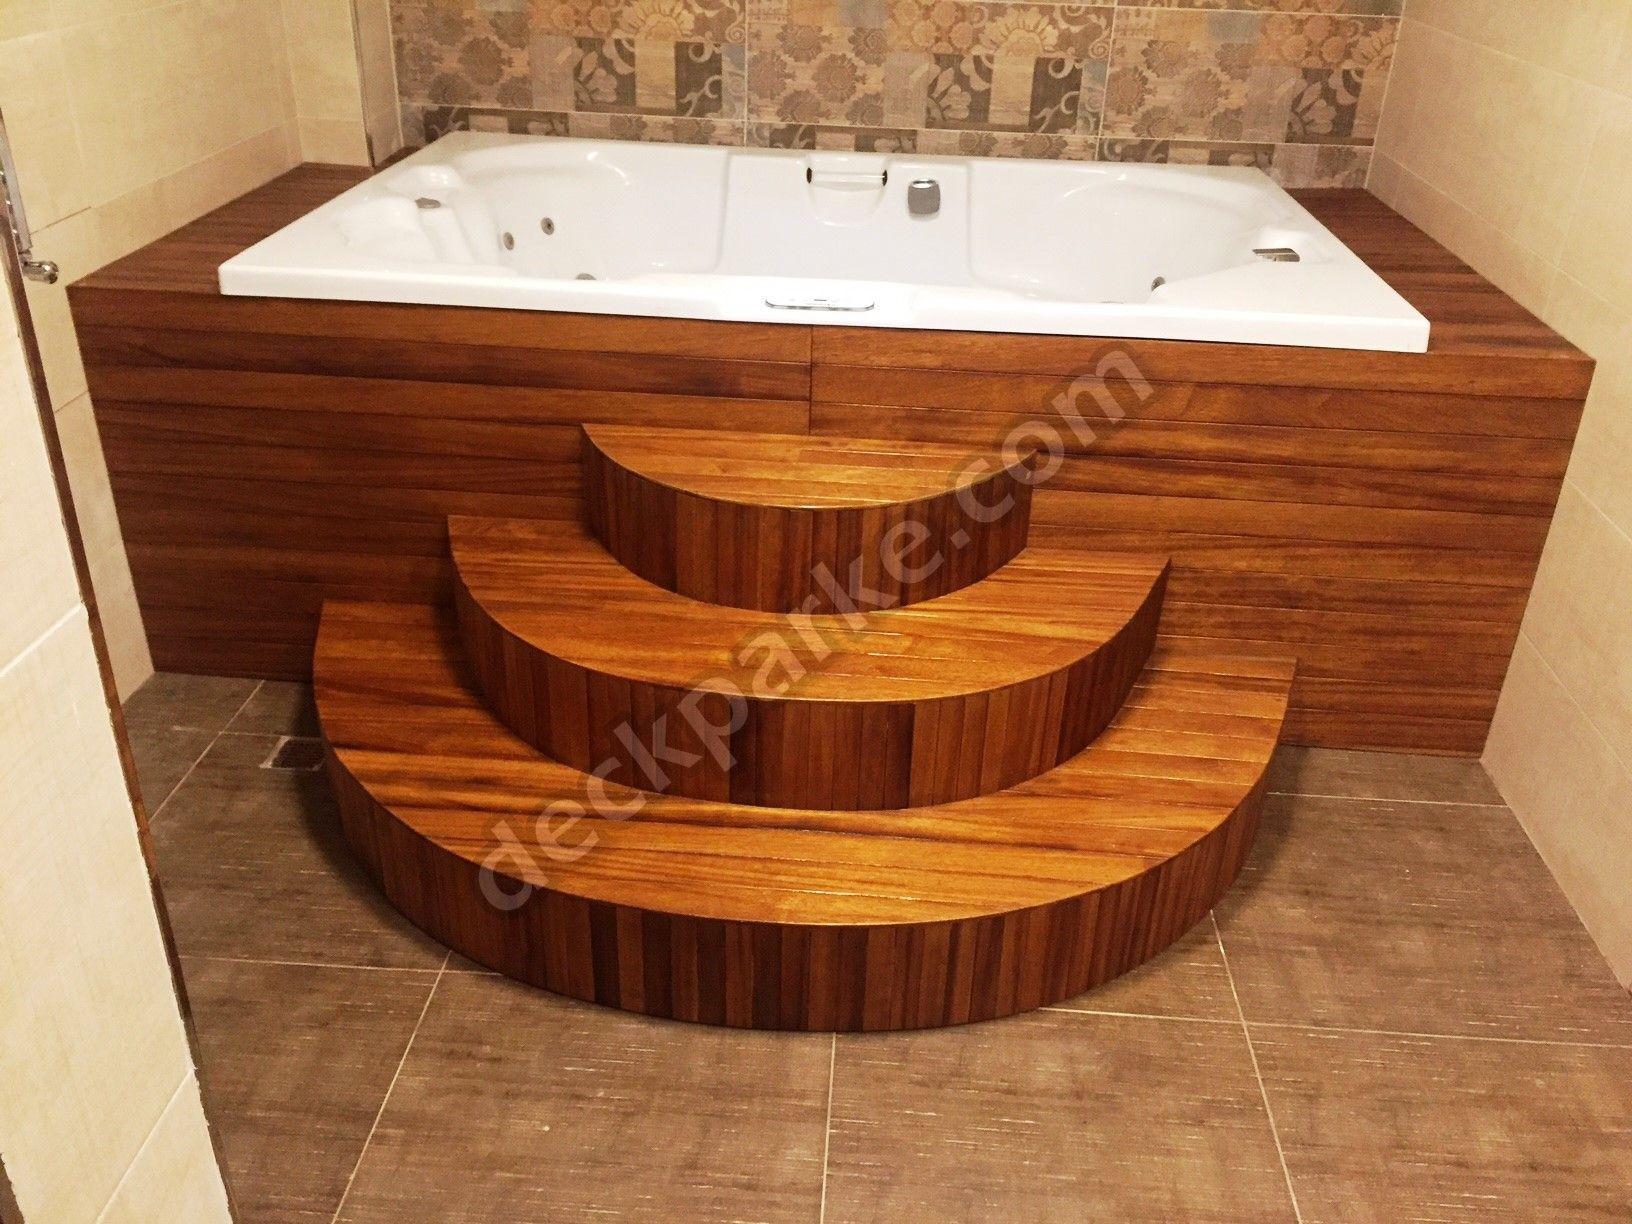 ogle hardwood flooring charlotte nc of jakuza sauna banyo duaž ahažap kaplama iroko teak aaŸaca±ndan a¶zel pertaining to jakuza sauna banyo duaž ahažap kaplama iroko teak aaŸaca±ndan a¶zel olarak kaplama